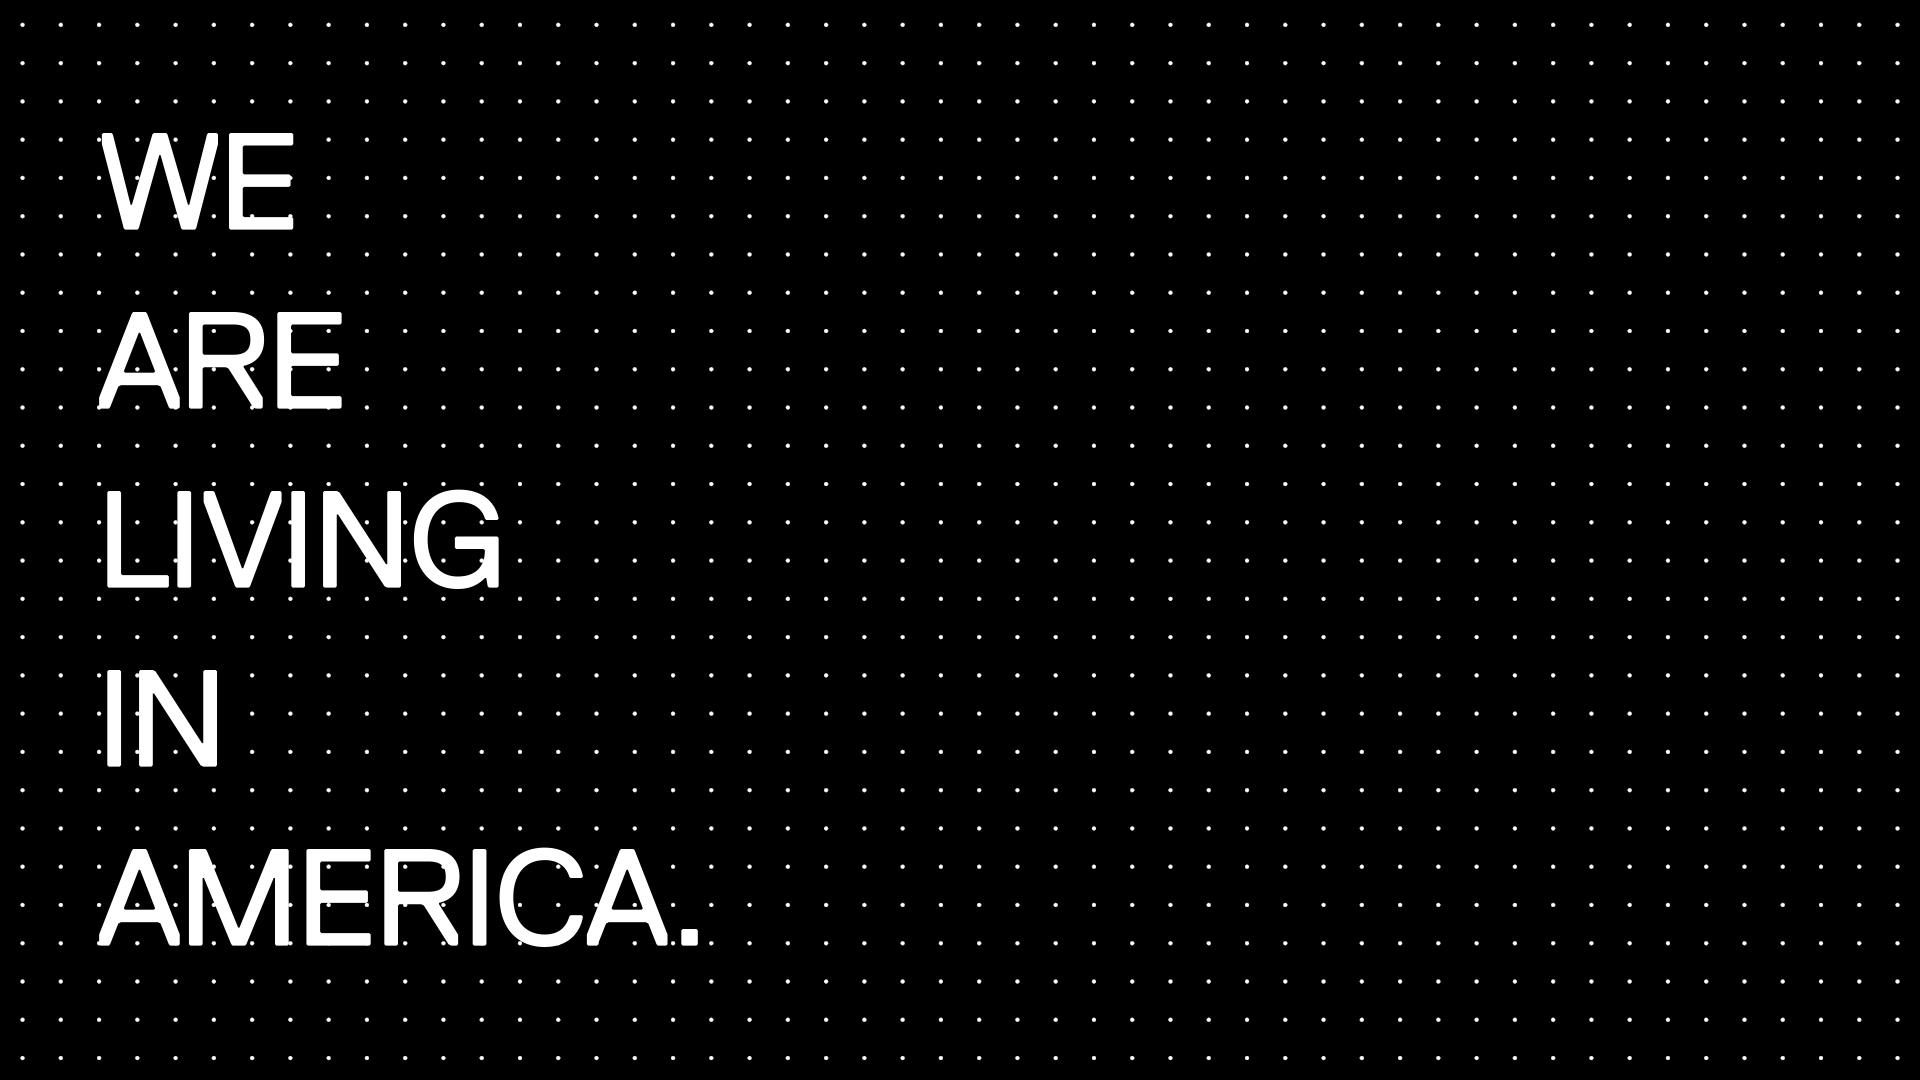 we_are_living_in_america_01.jpg